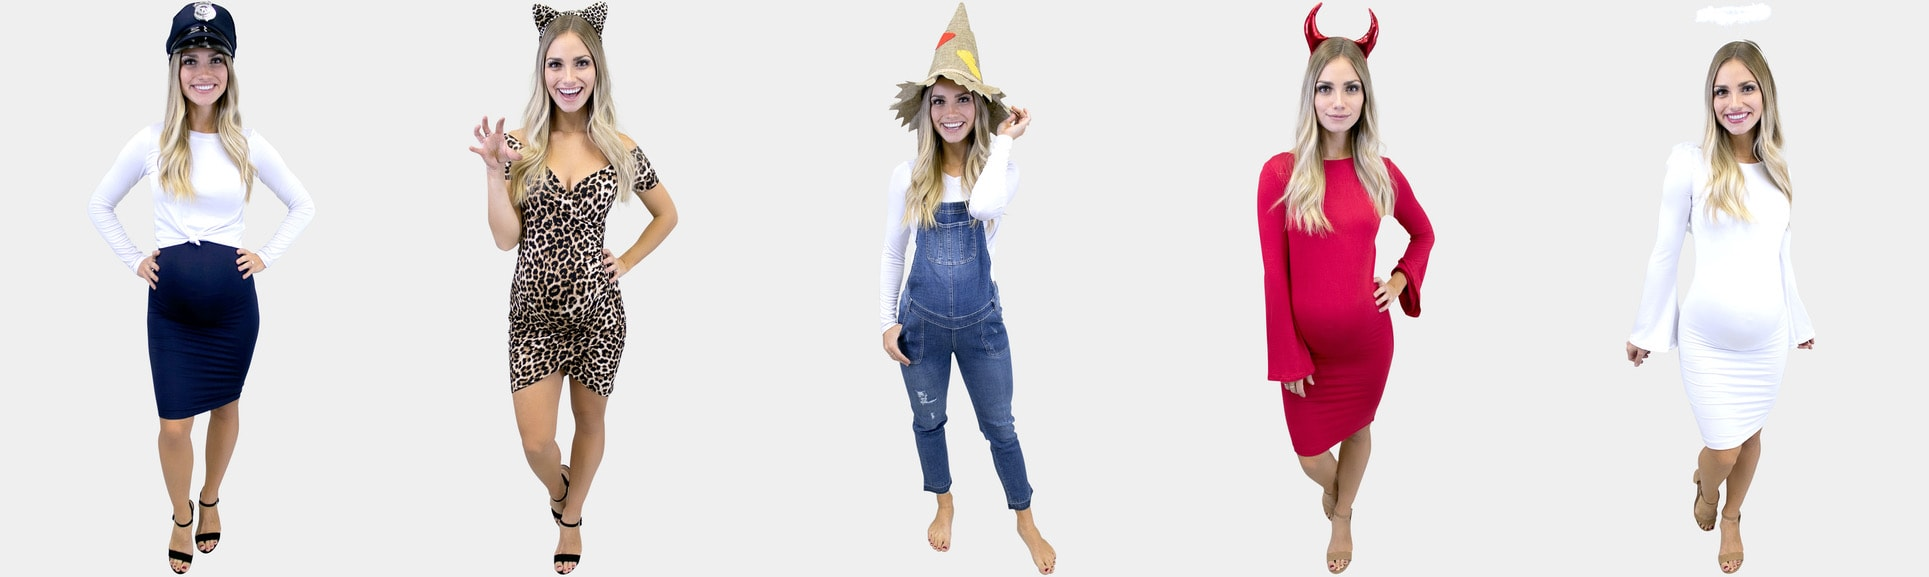 Best Maternity Halloween Costumes